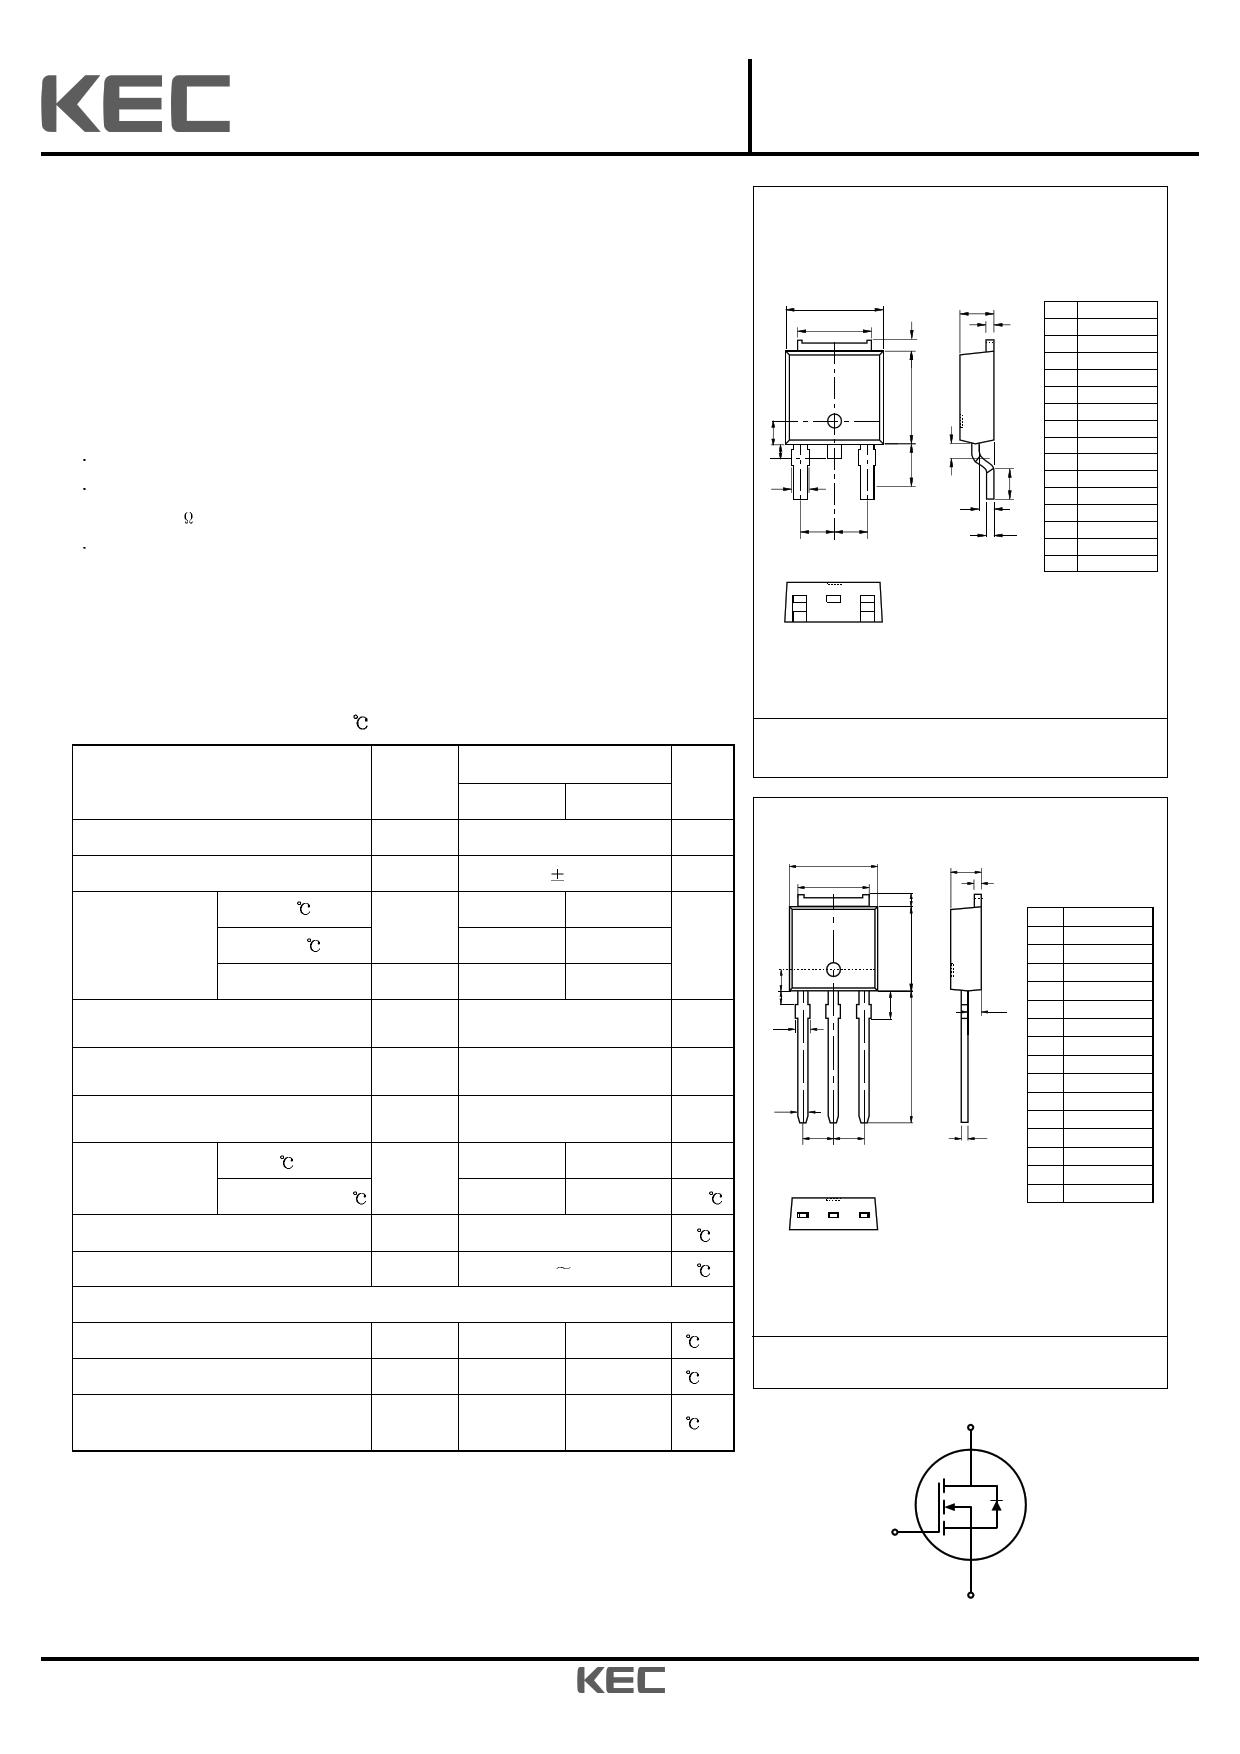 1D0N60D datasheet image